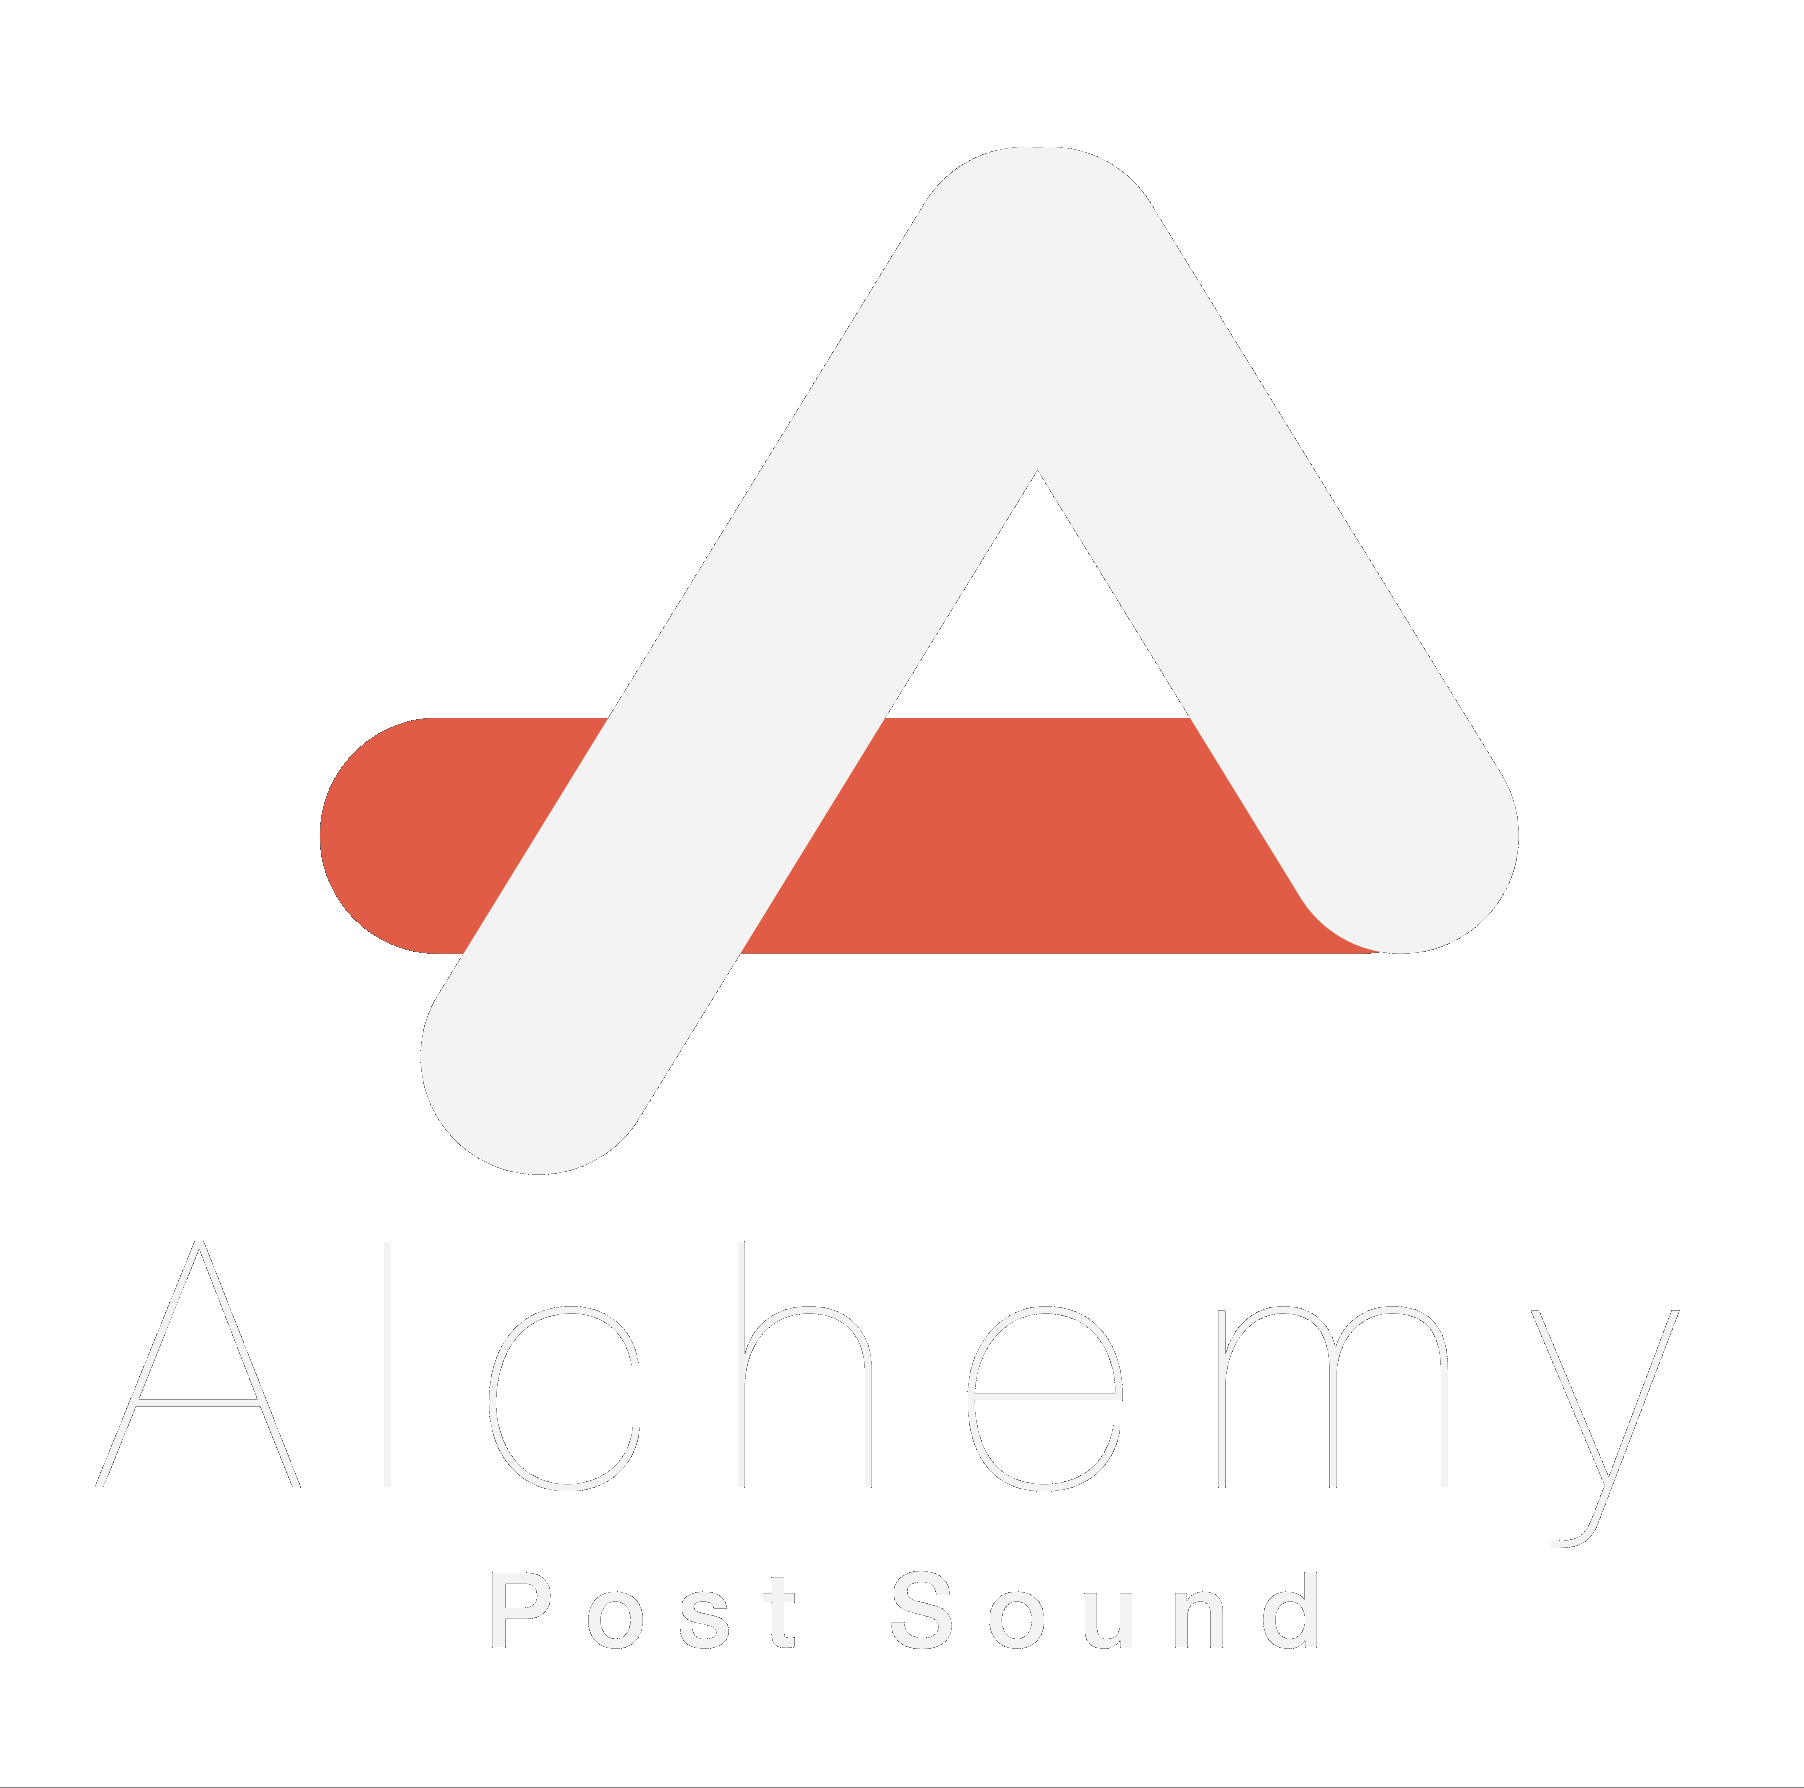 Alchemy Post Sound